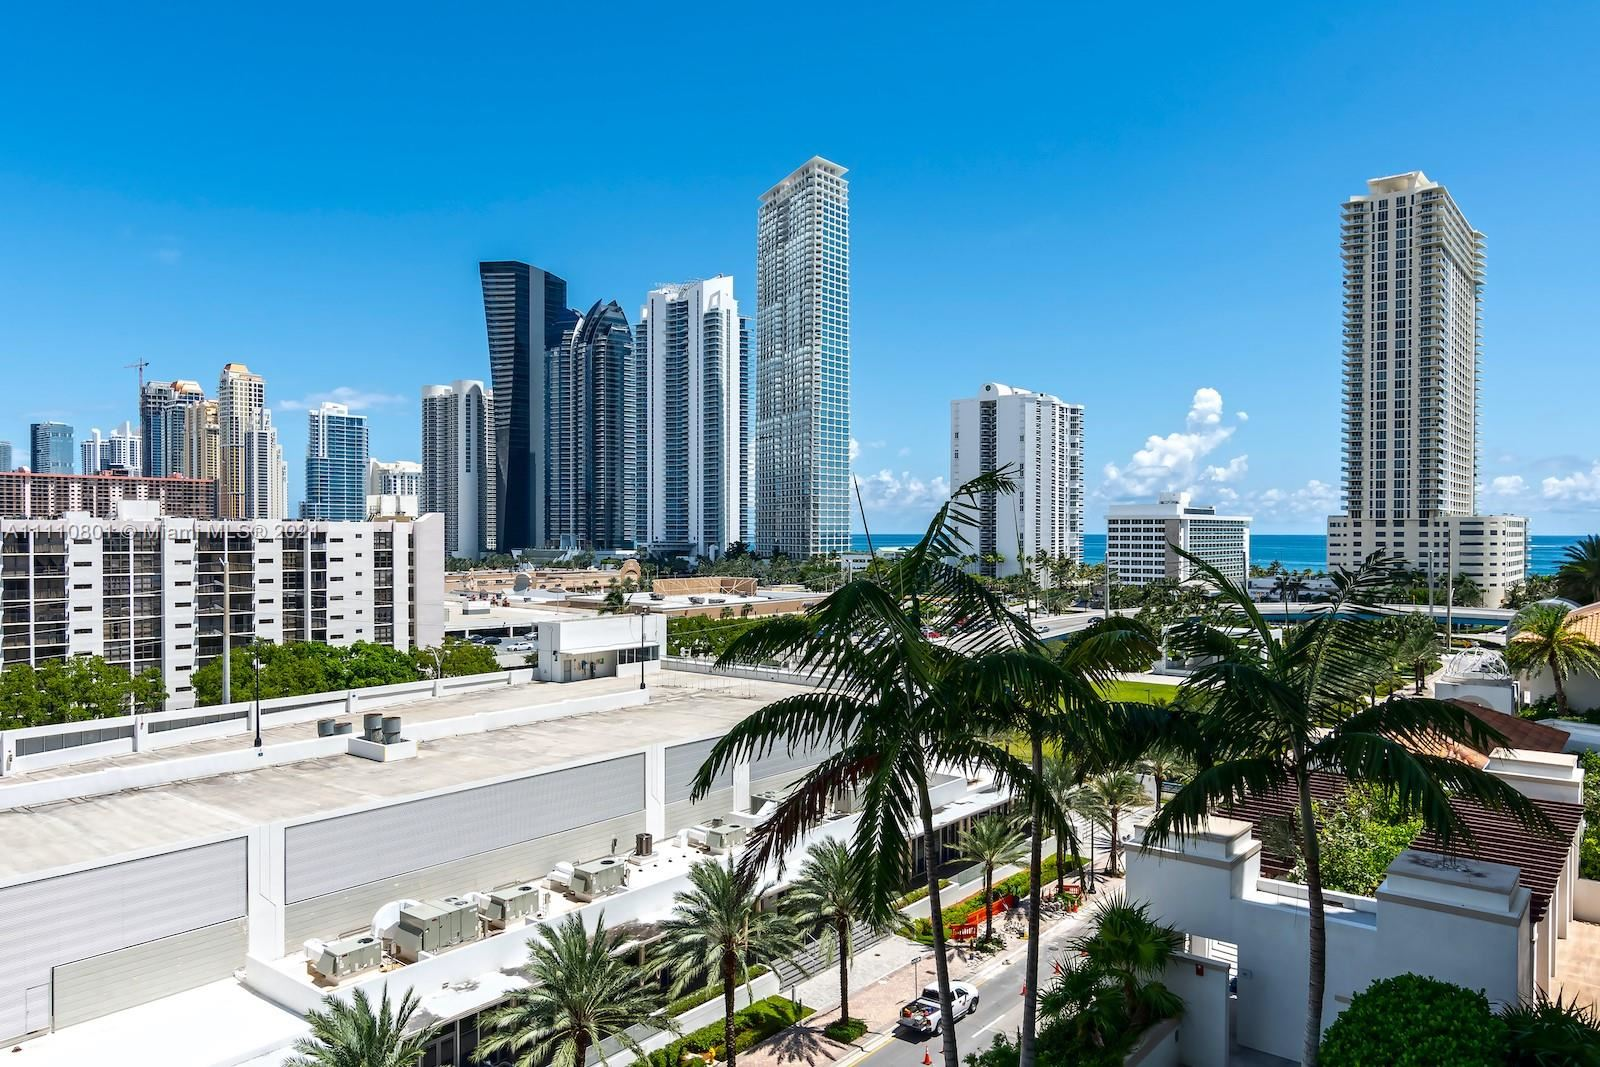 Photo of 300 N Sunny Isles Blvd #4-805, Sunny Isles Beach, FL 33160 (MLS # A11110801)